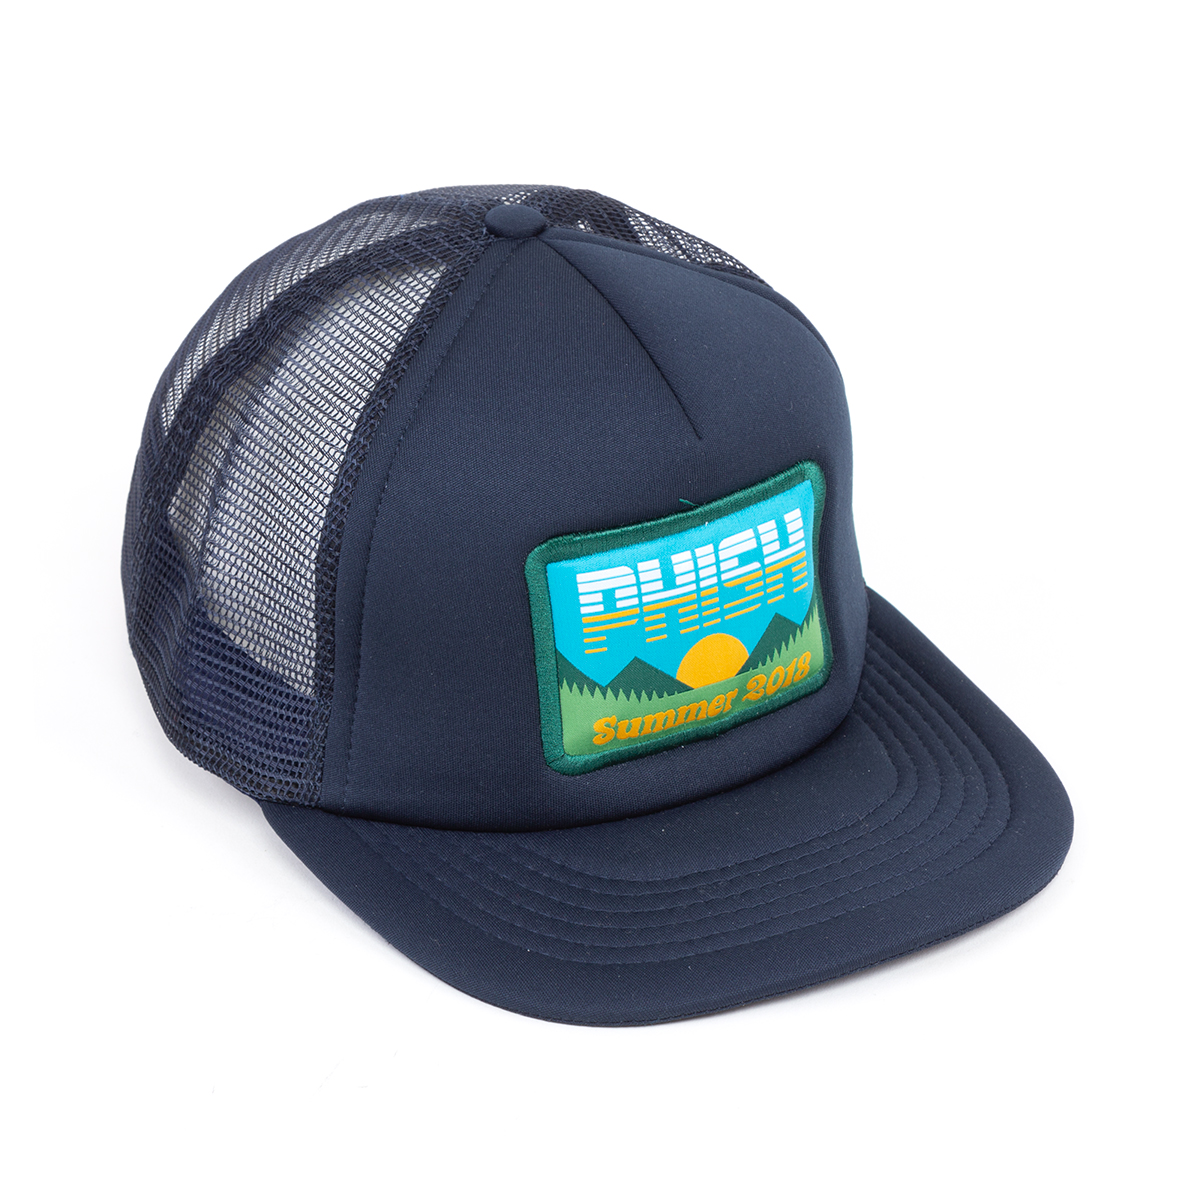 Summer Sunset 2018 Trucker Hat